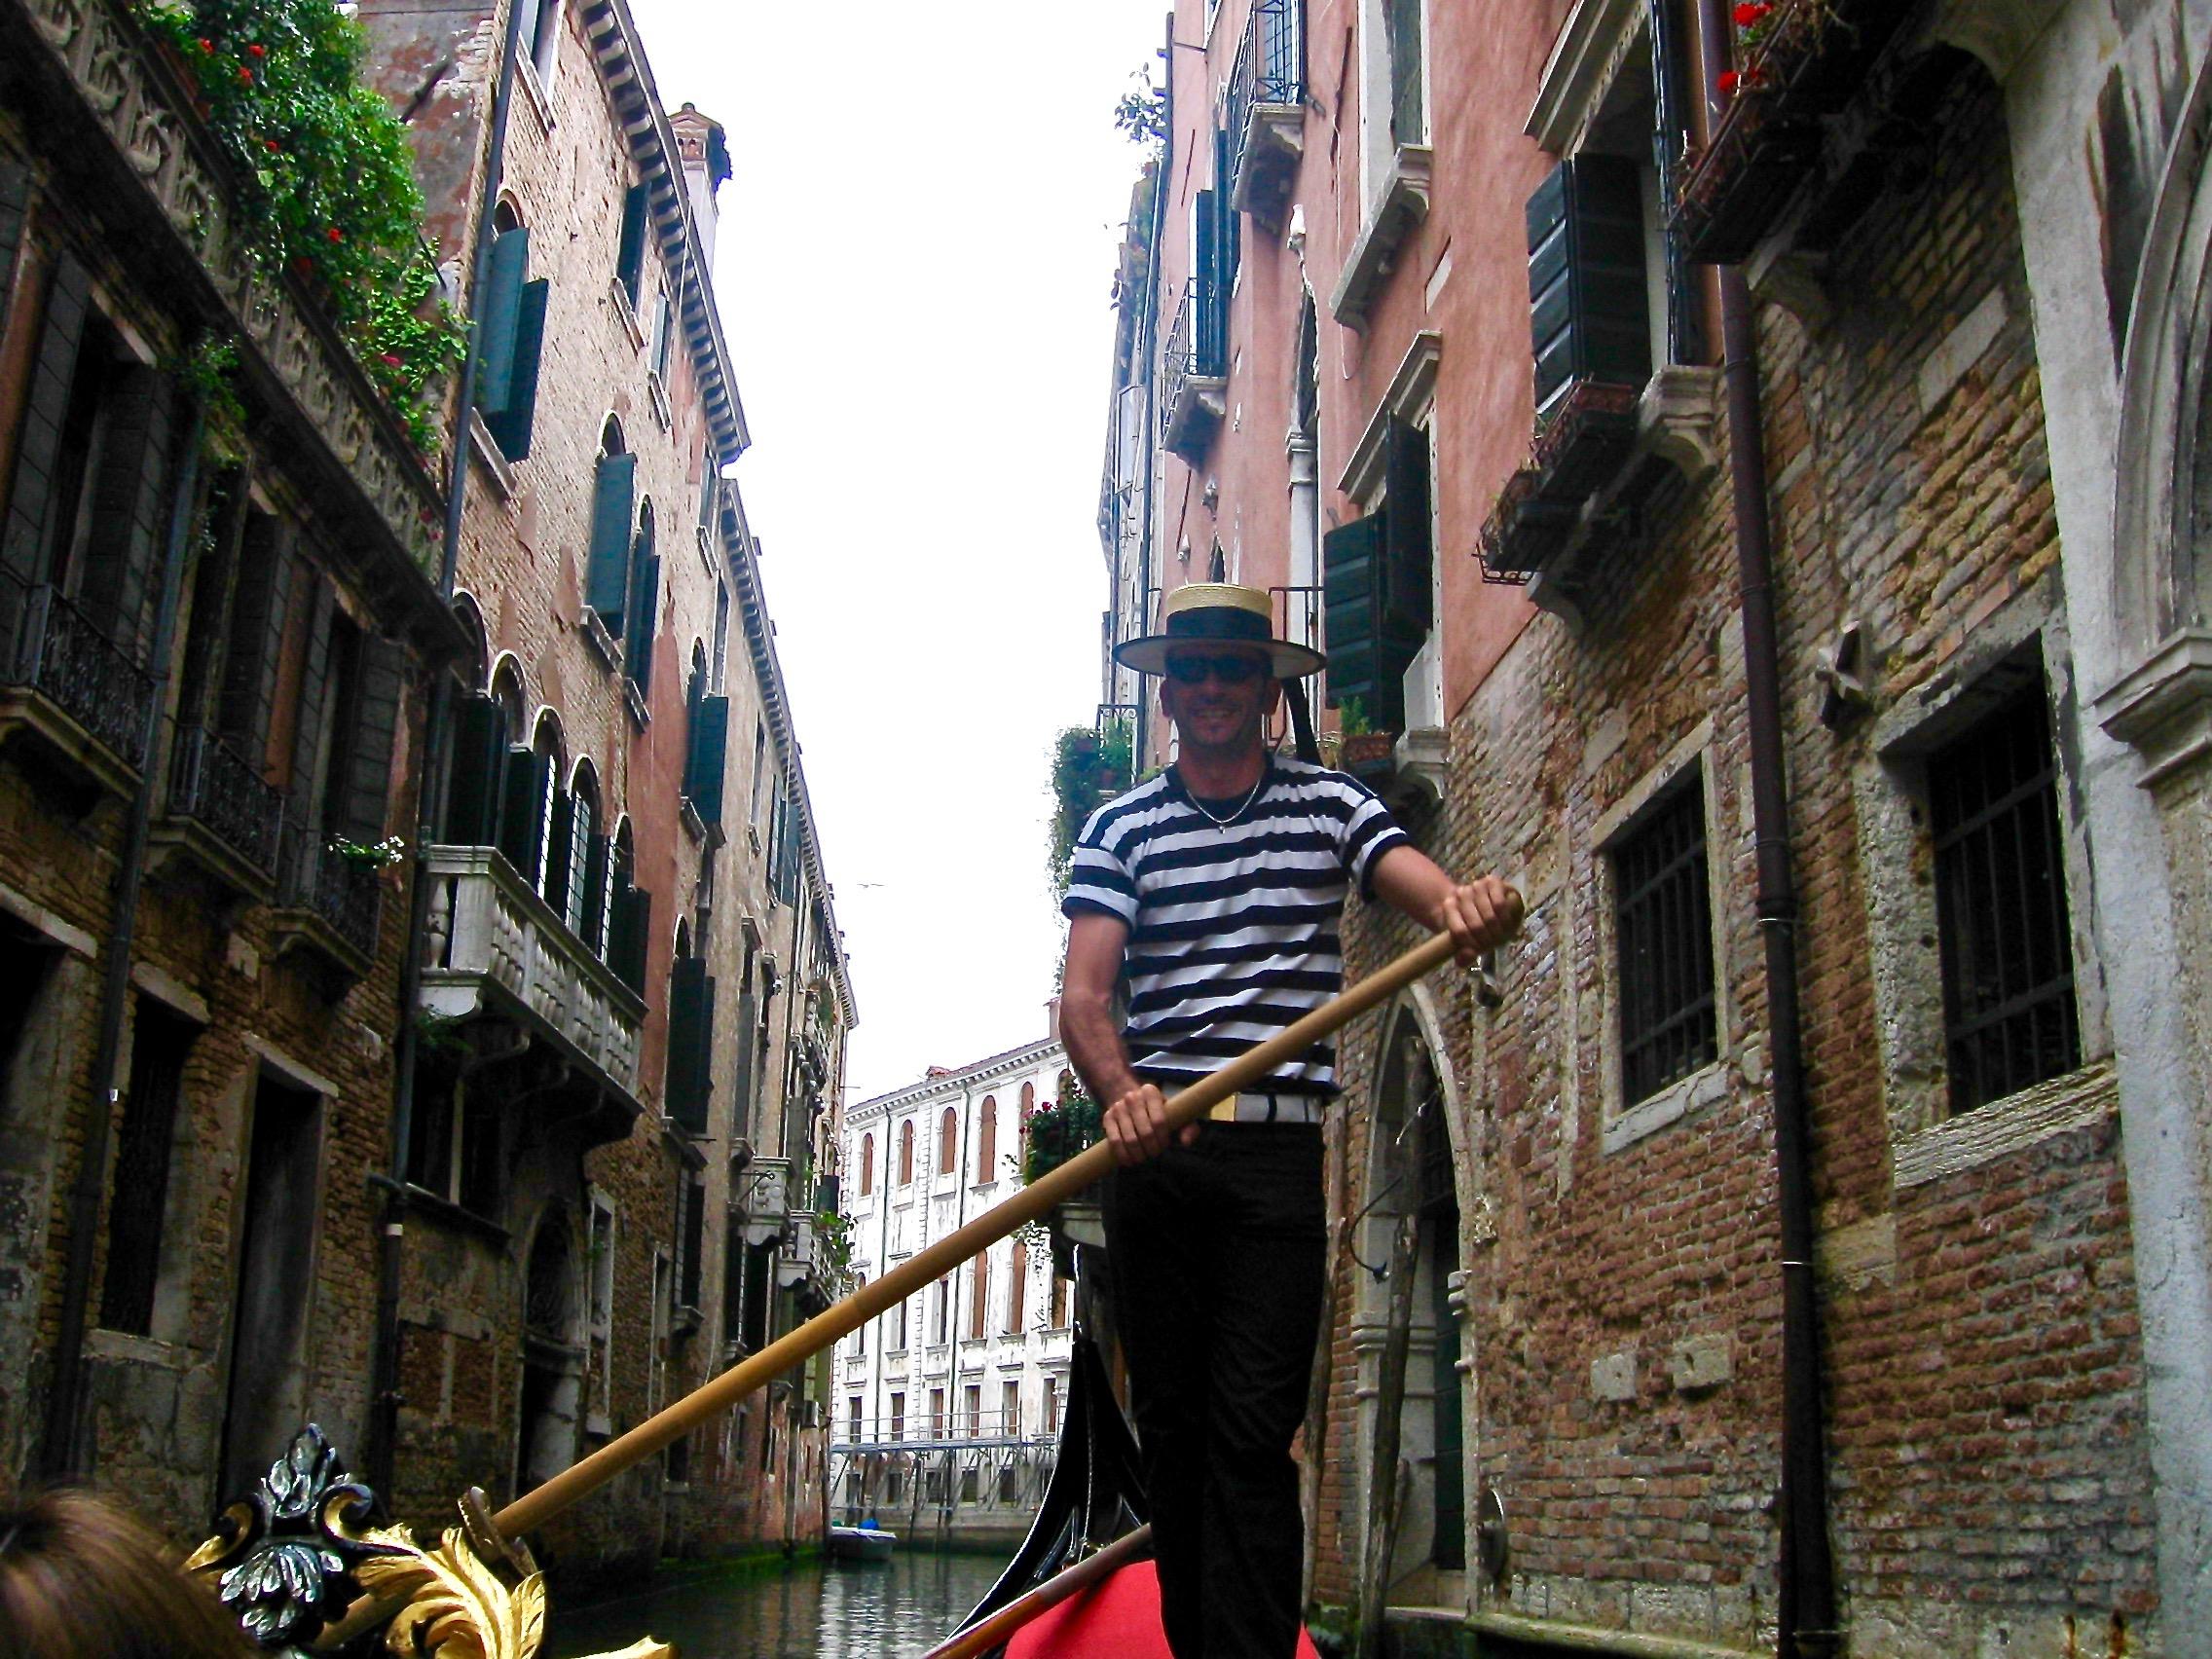 A gondolier in Venice, Italy